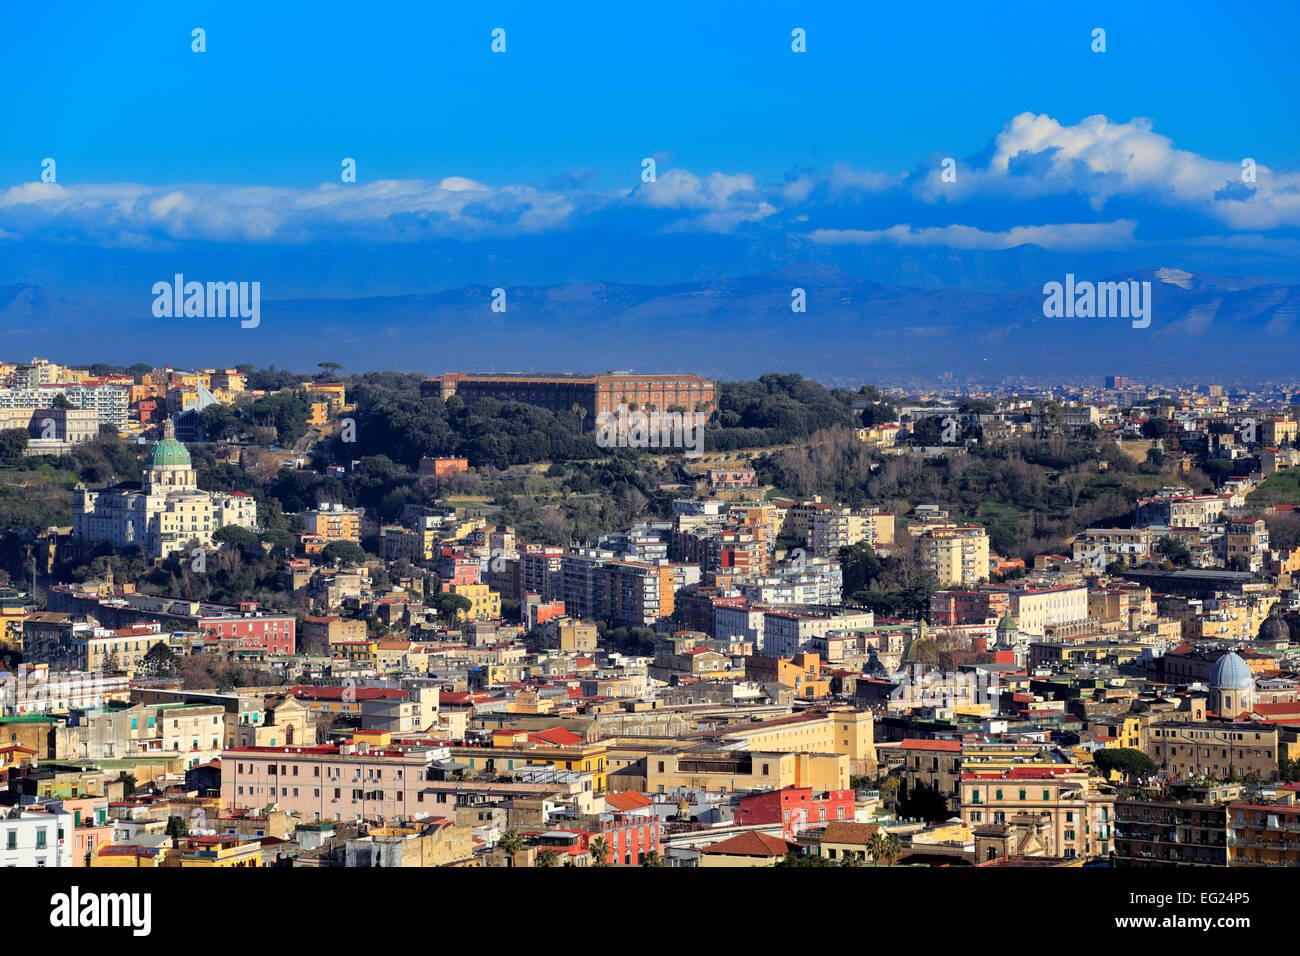 View to Capodimonte from Certosa di San Martino, Naples, Campania, Italy Stock Photo